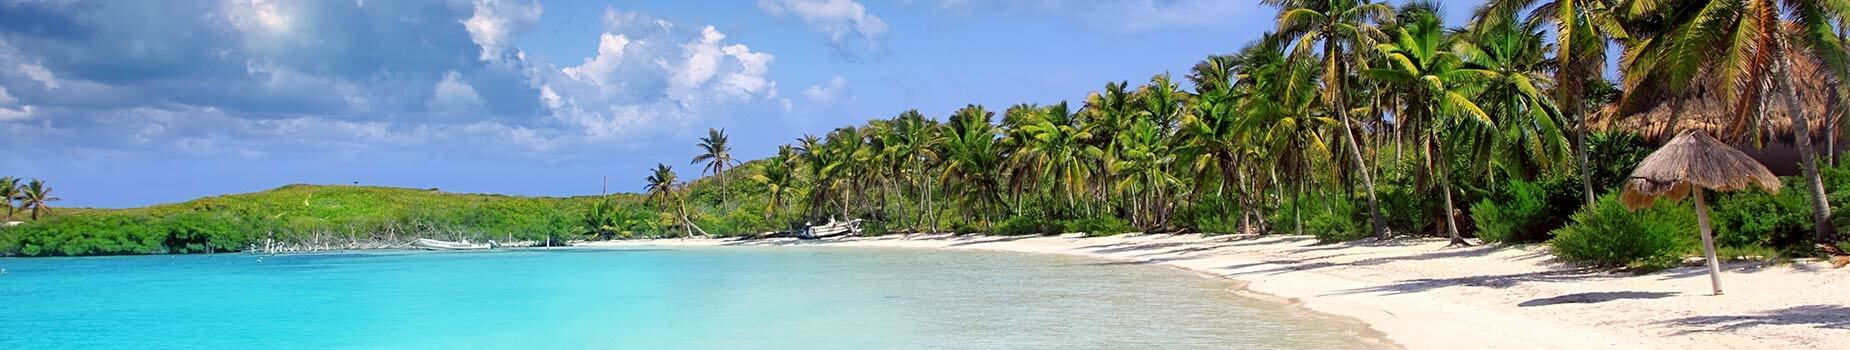 Fly Drive Caraïben